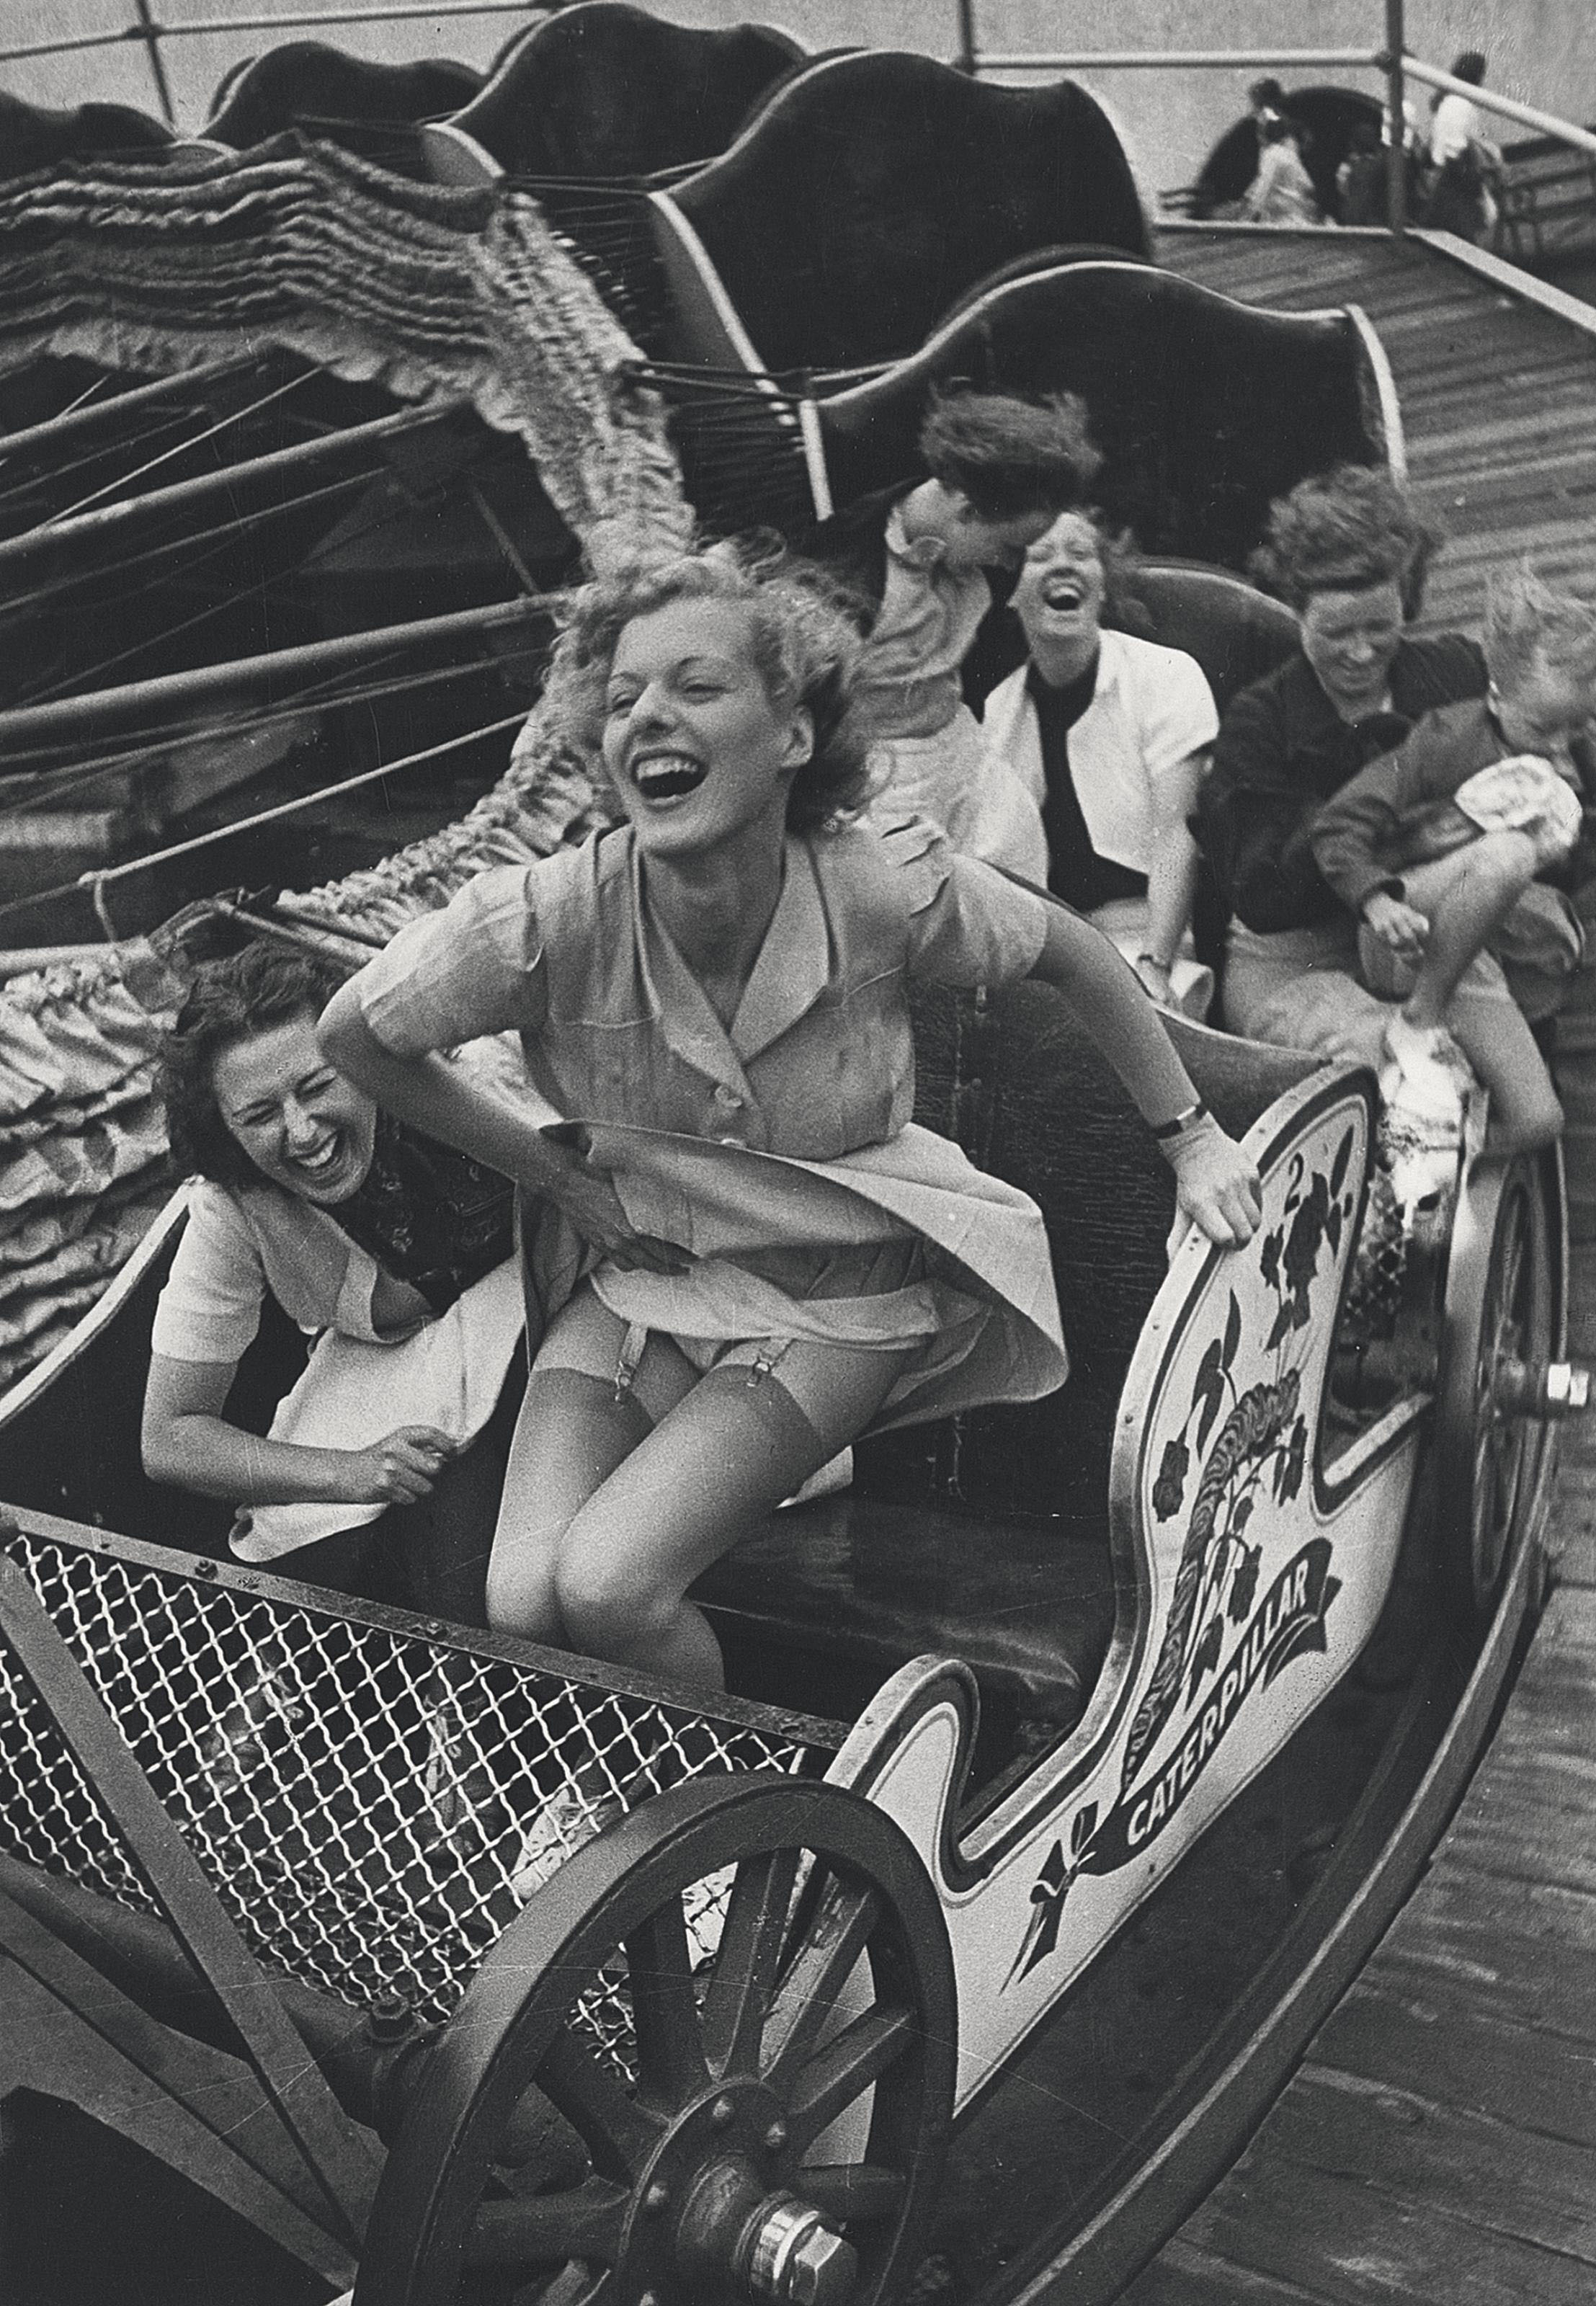 Care free, 1949